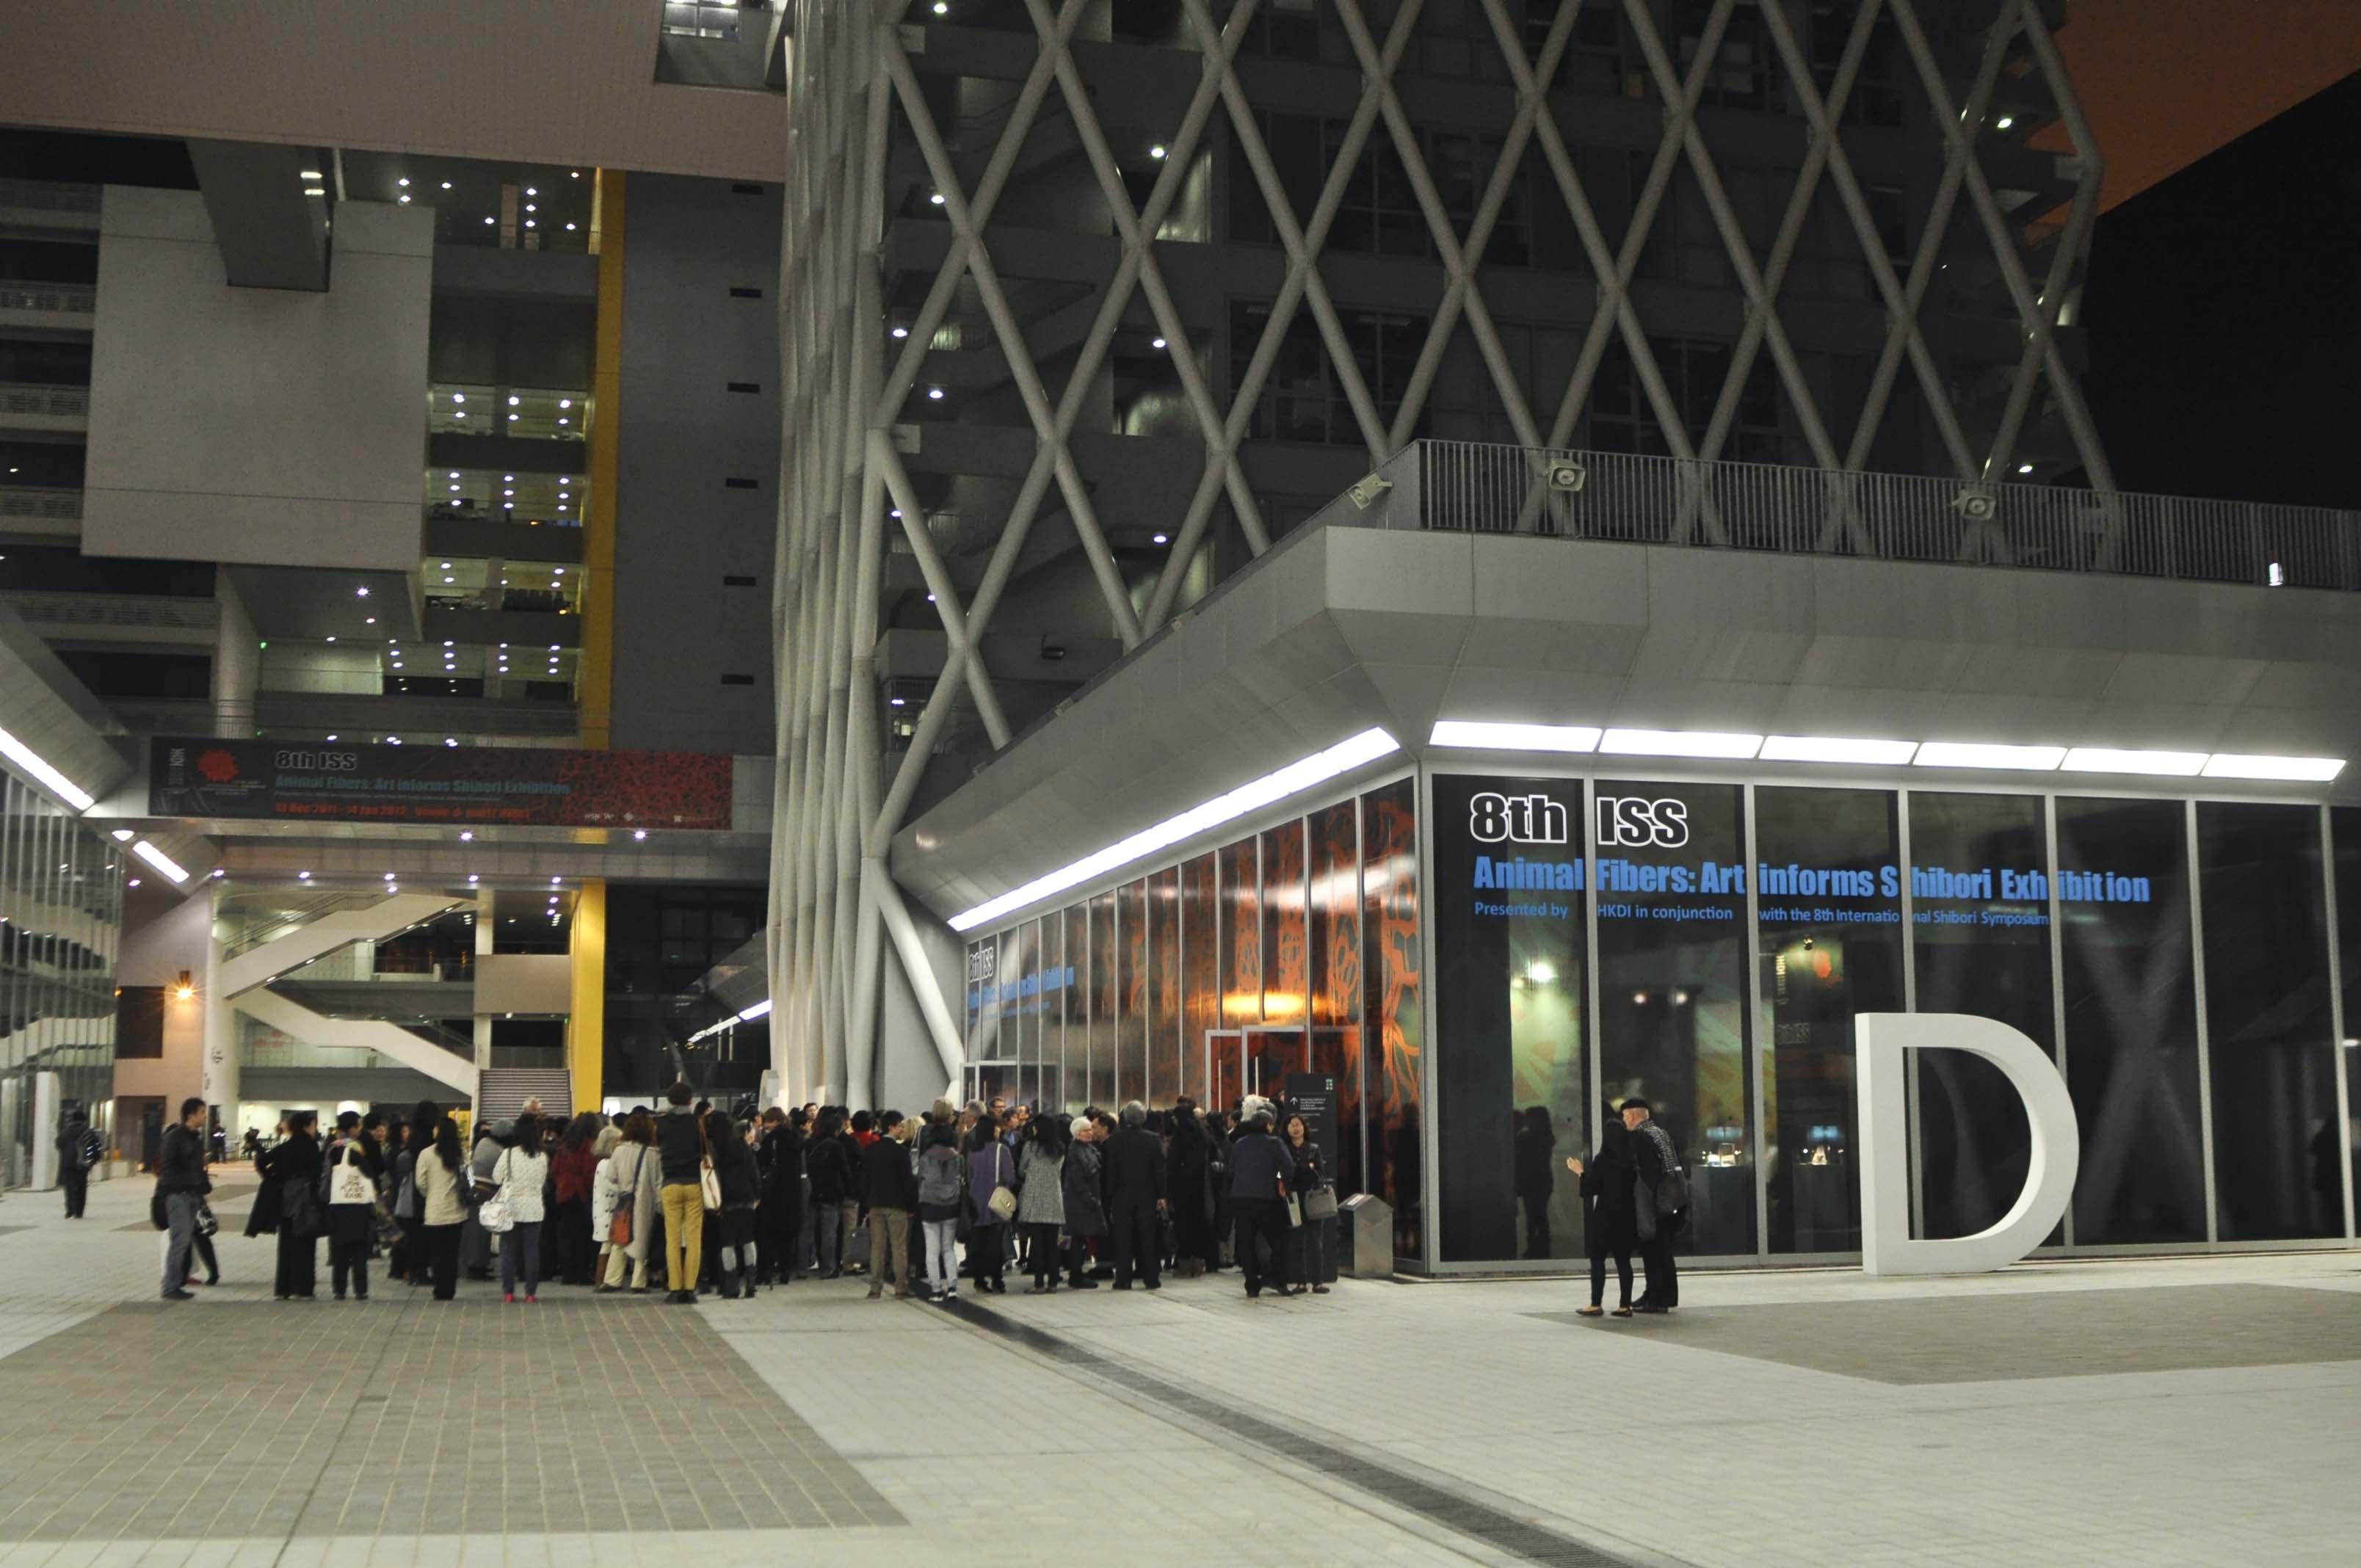 D Exhibition Hong Kong : The th large scale public media art exhibition human vibrations